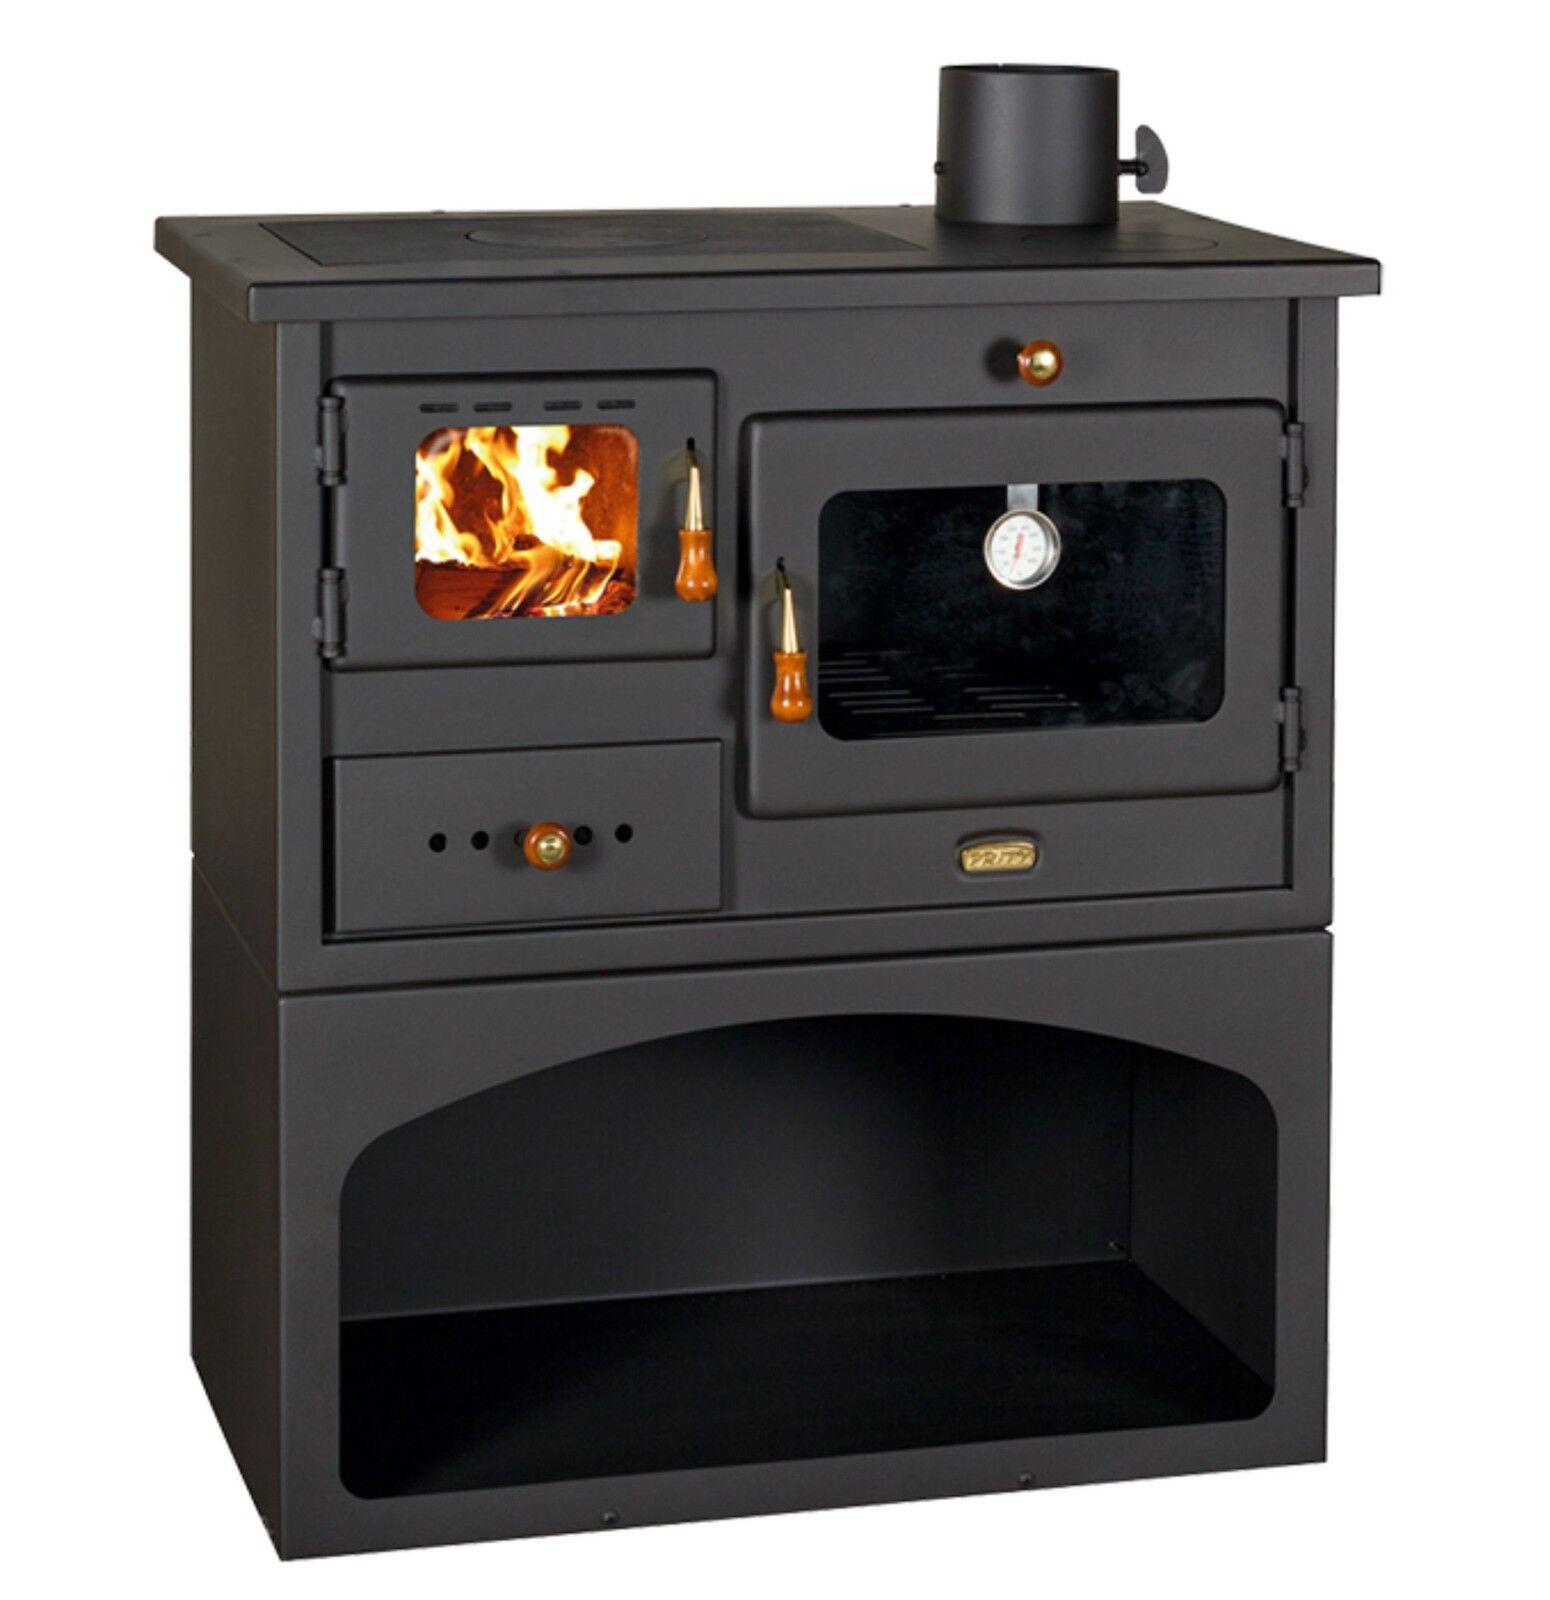 holz verbrennung gusseisen top feste brennstoffe kochen herd kamin mit ofen 10 ebay. Black Bedroom Furniture Sets. Home Design Ideas